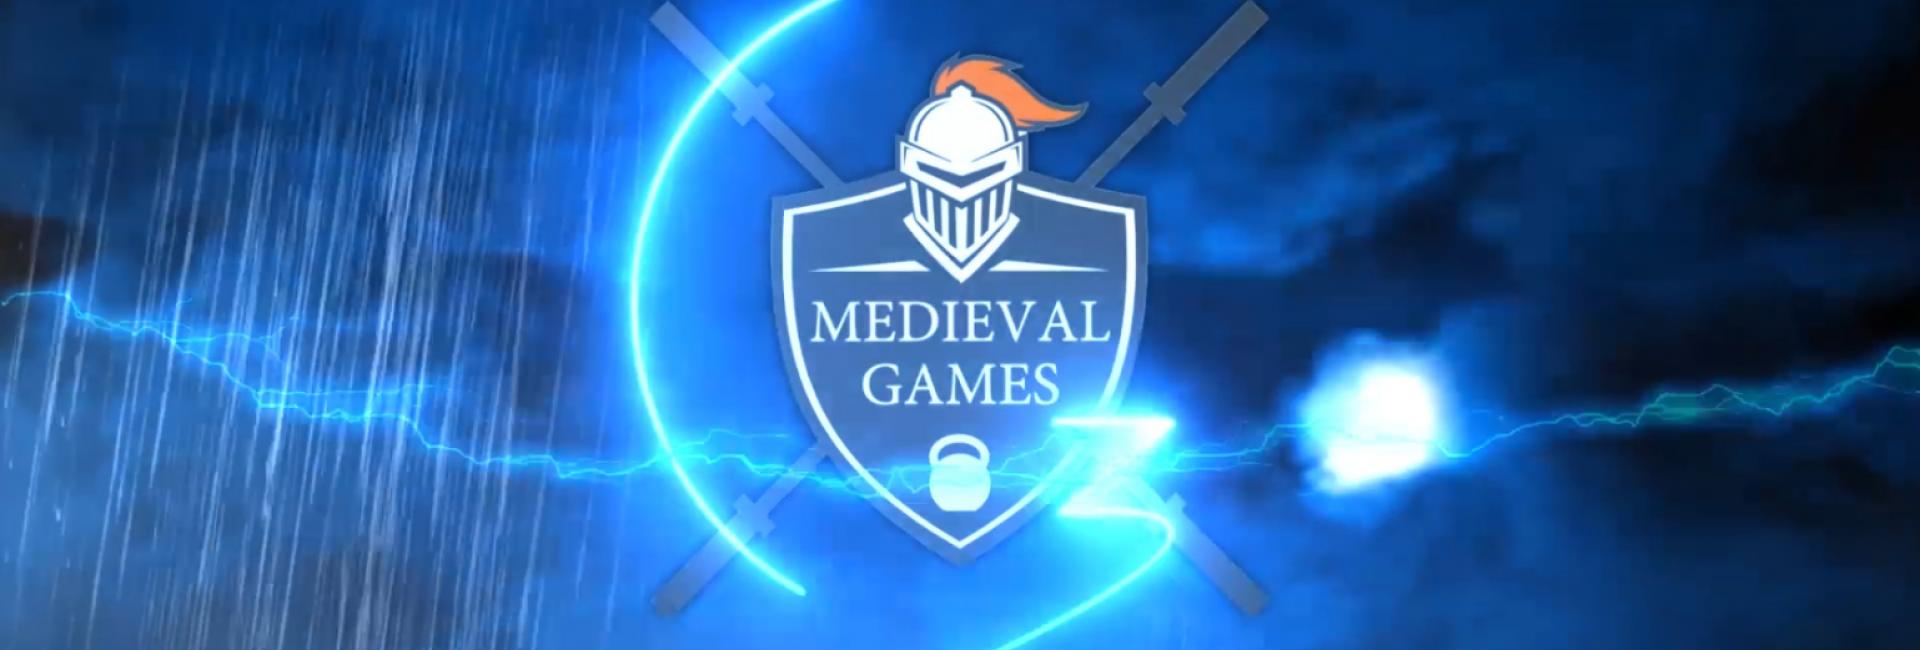 Medieval Games 2019 - pakiet